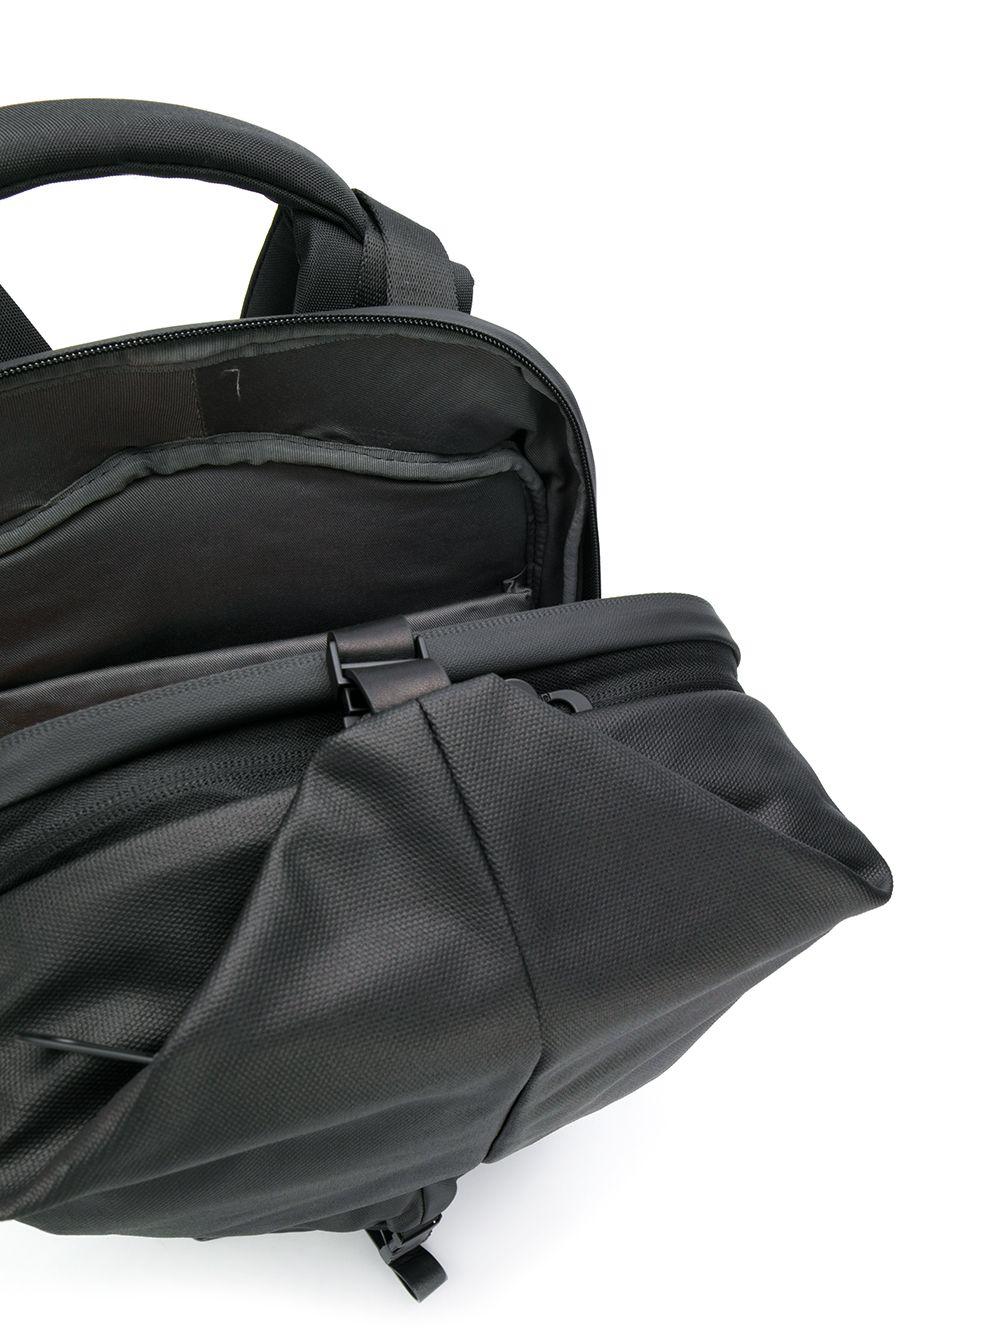 Côte & Ciel | Cote&Ciel рюкзак Oril среднего размера | Clouty